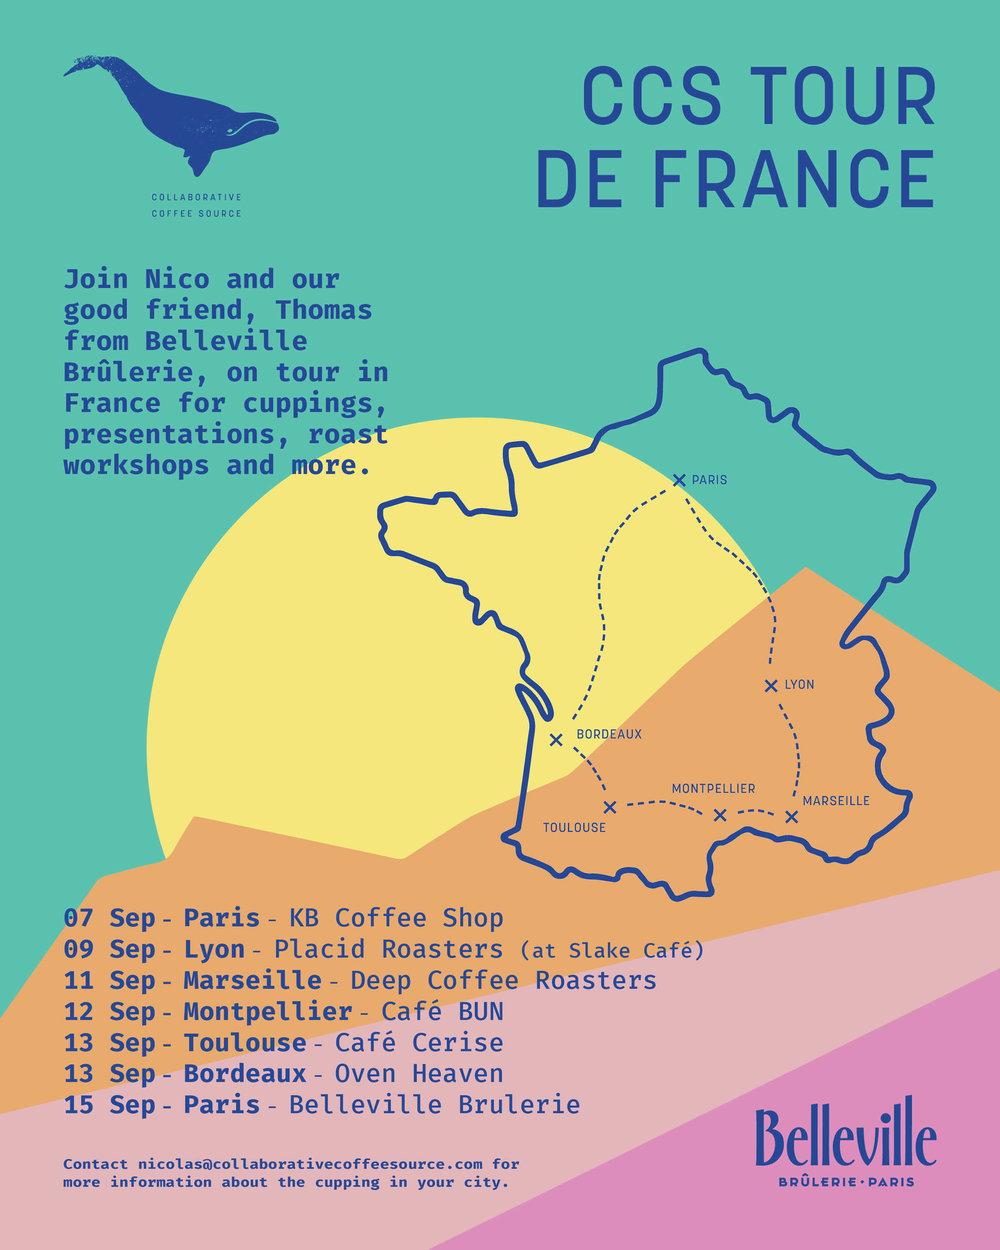 CCS Tour De France Insta.jpg